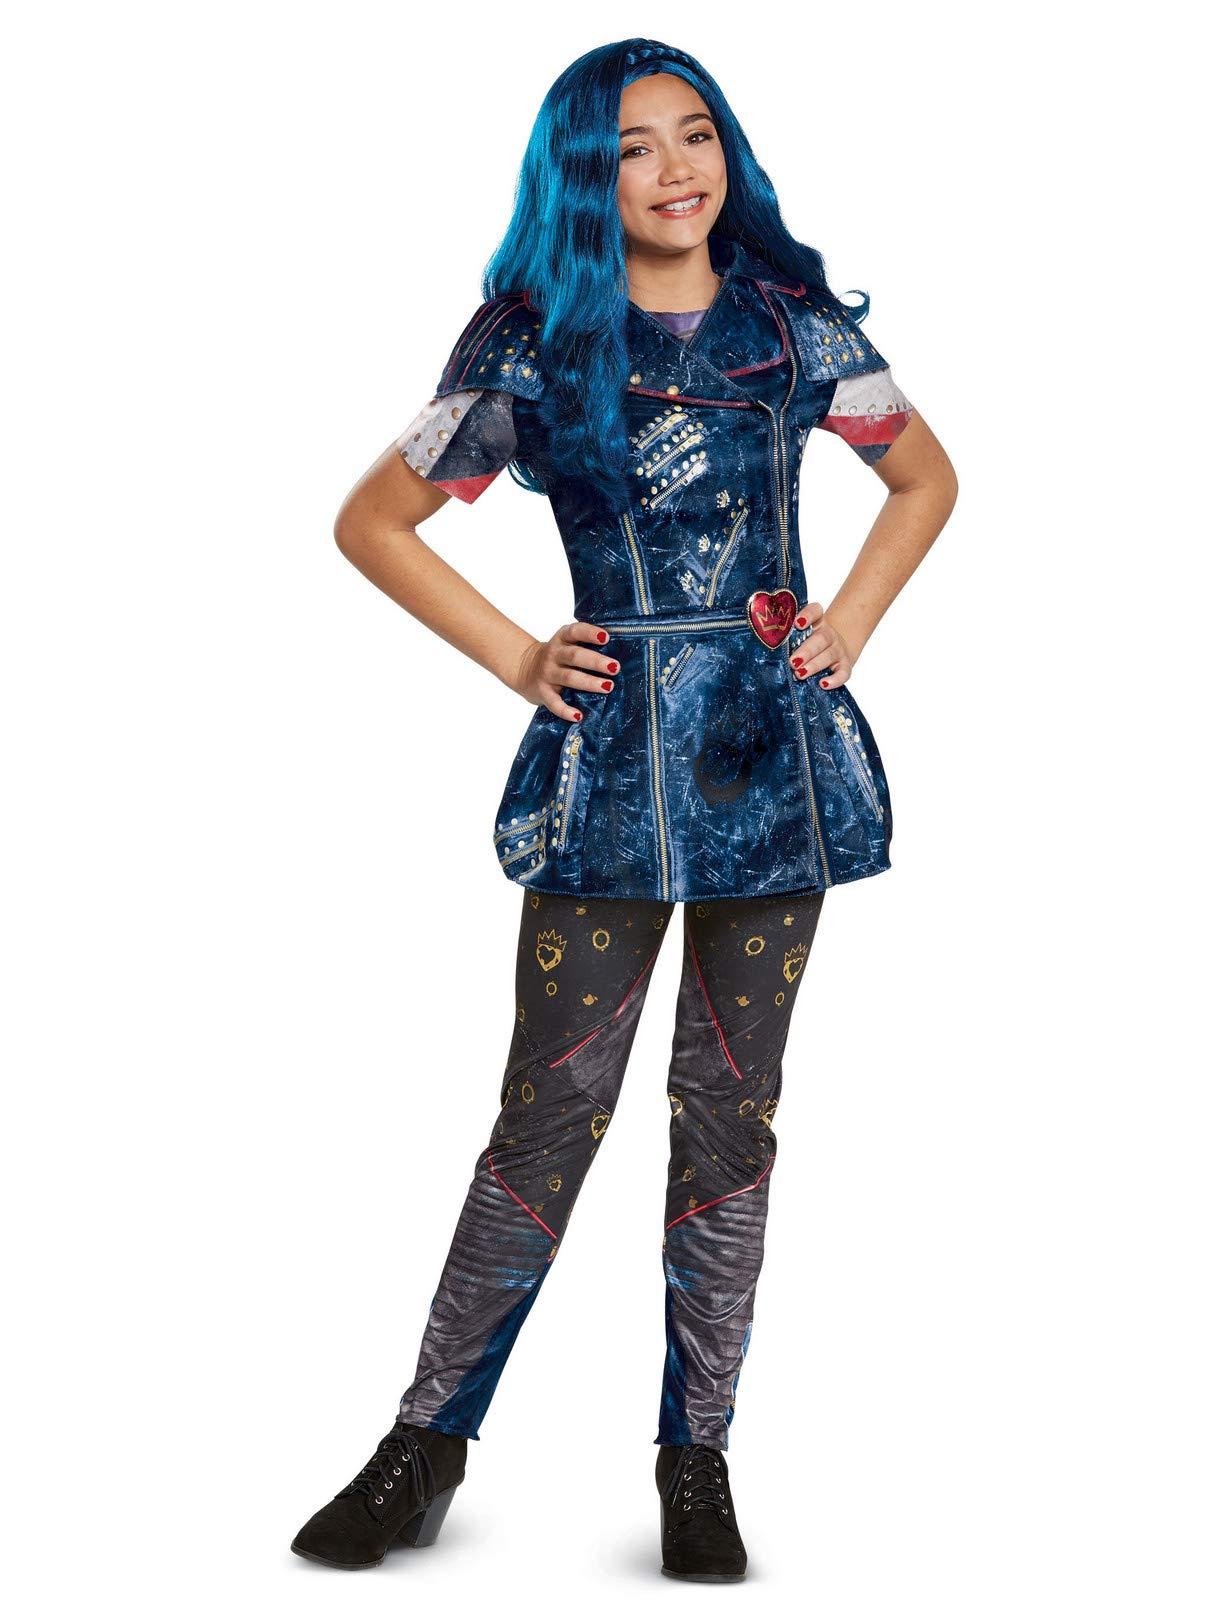 Disguise Evie Classic Descendants 2 Costume, Blue, Small (4-6X)